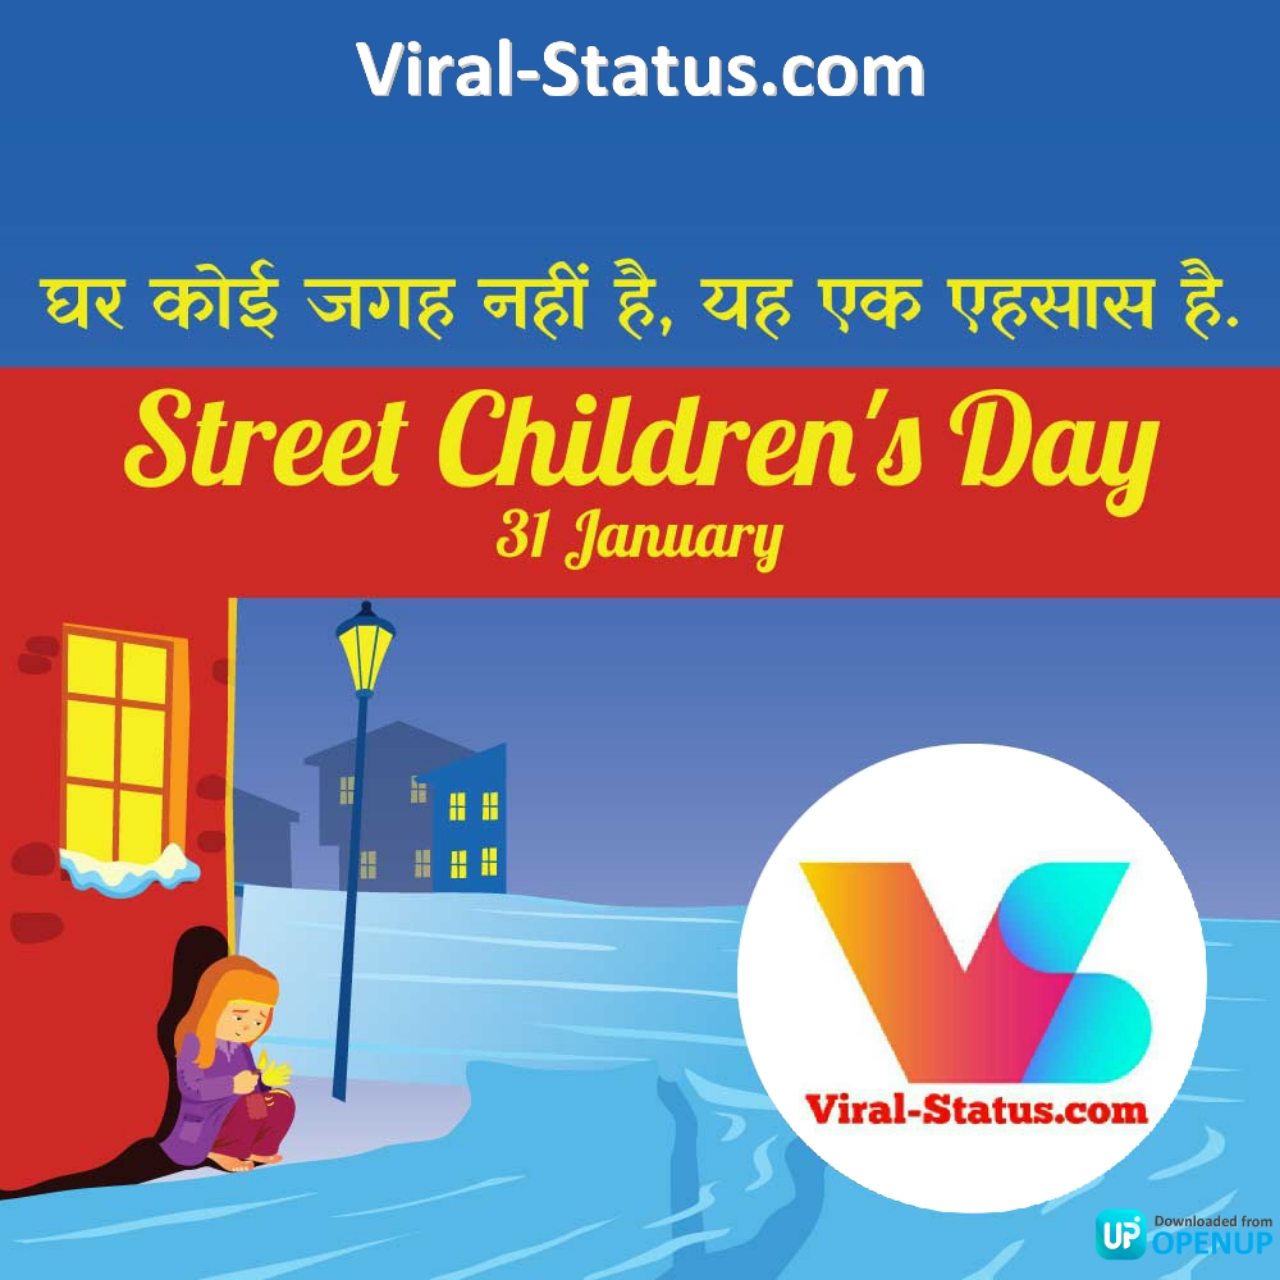 street children's day in india